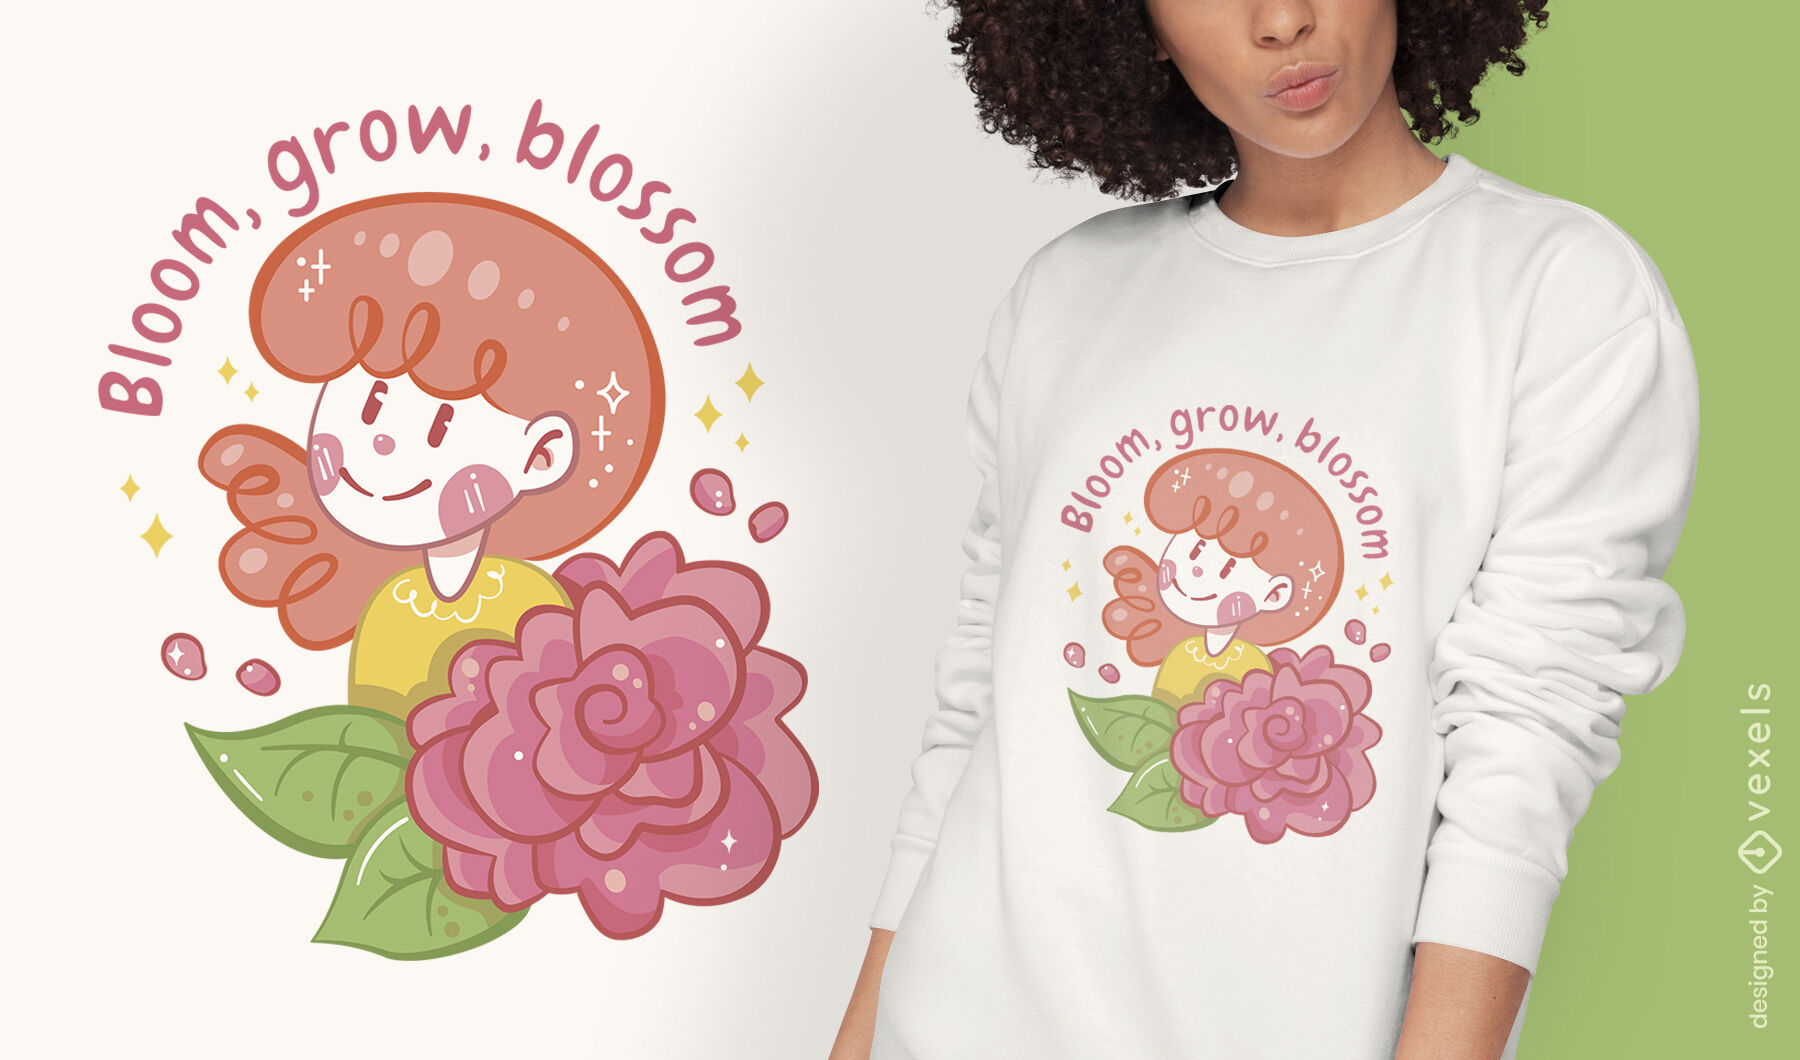 Dise?o de camiseta floreciente de ni?a de las flores